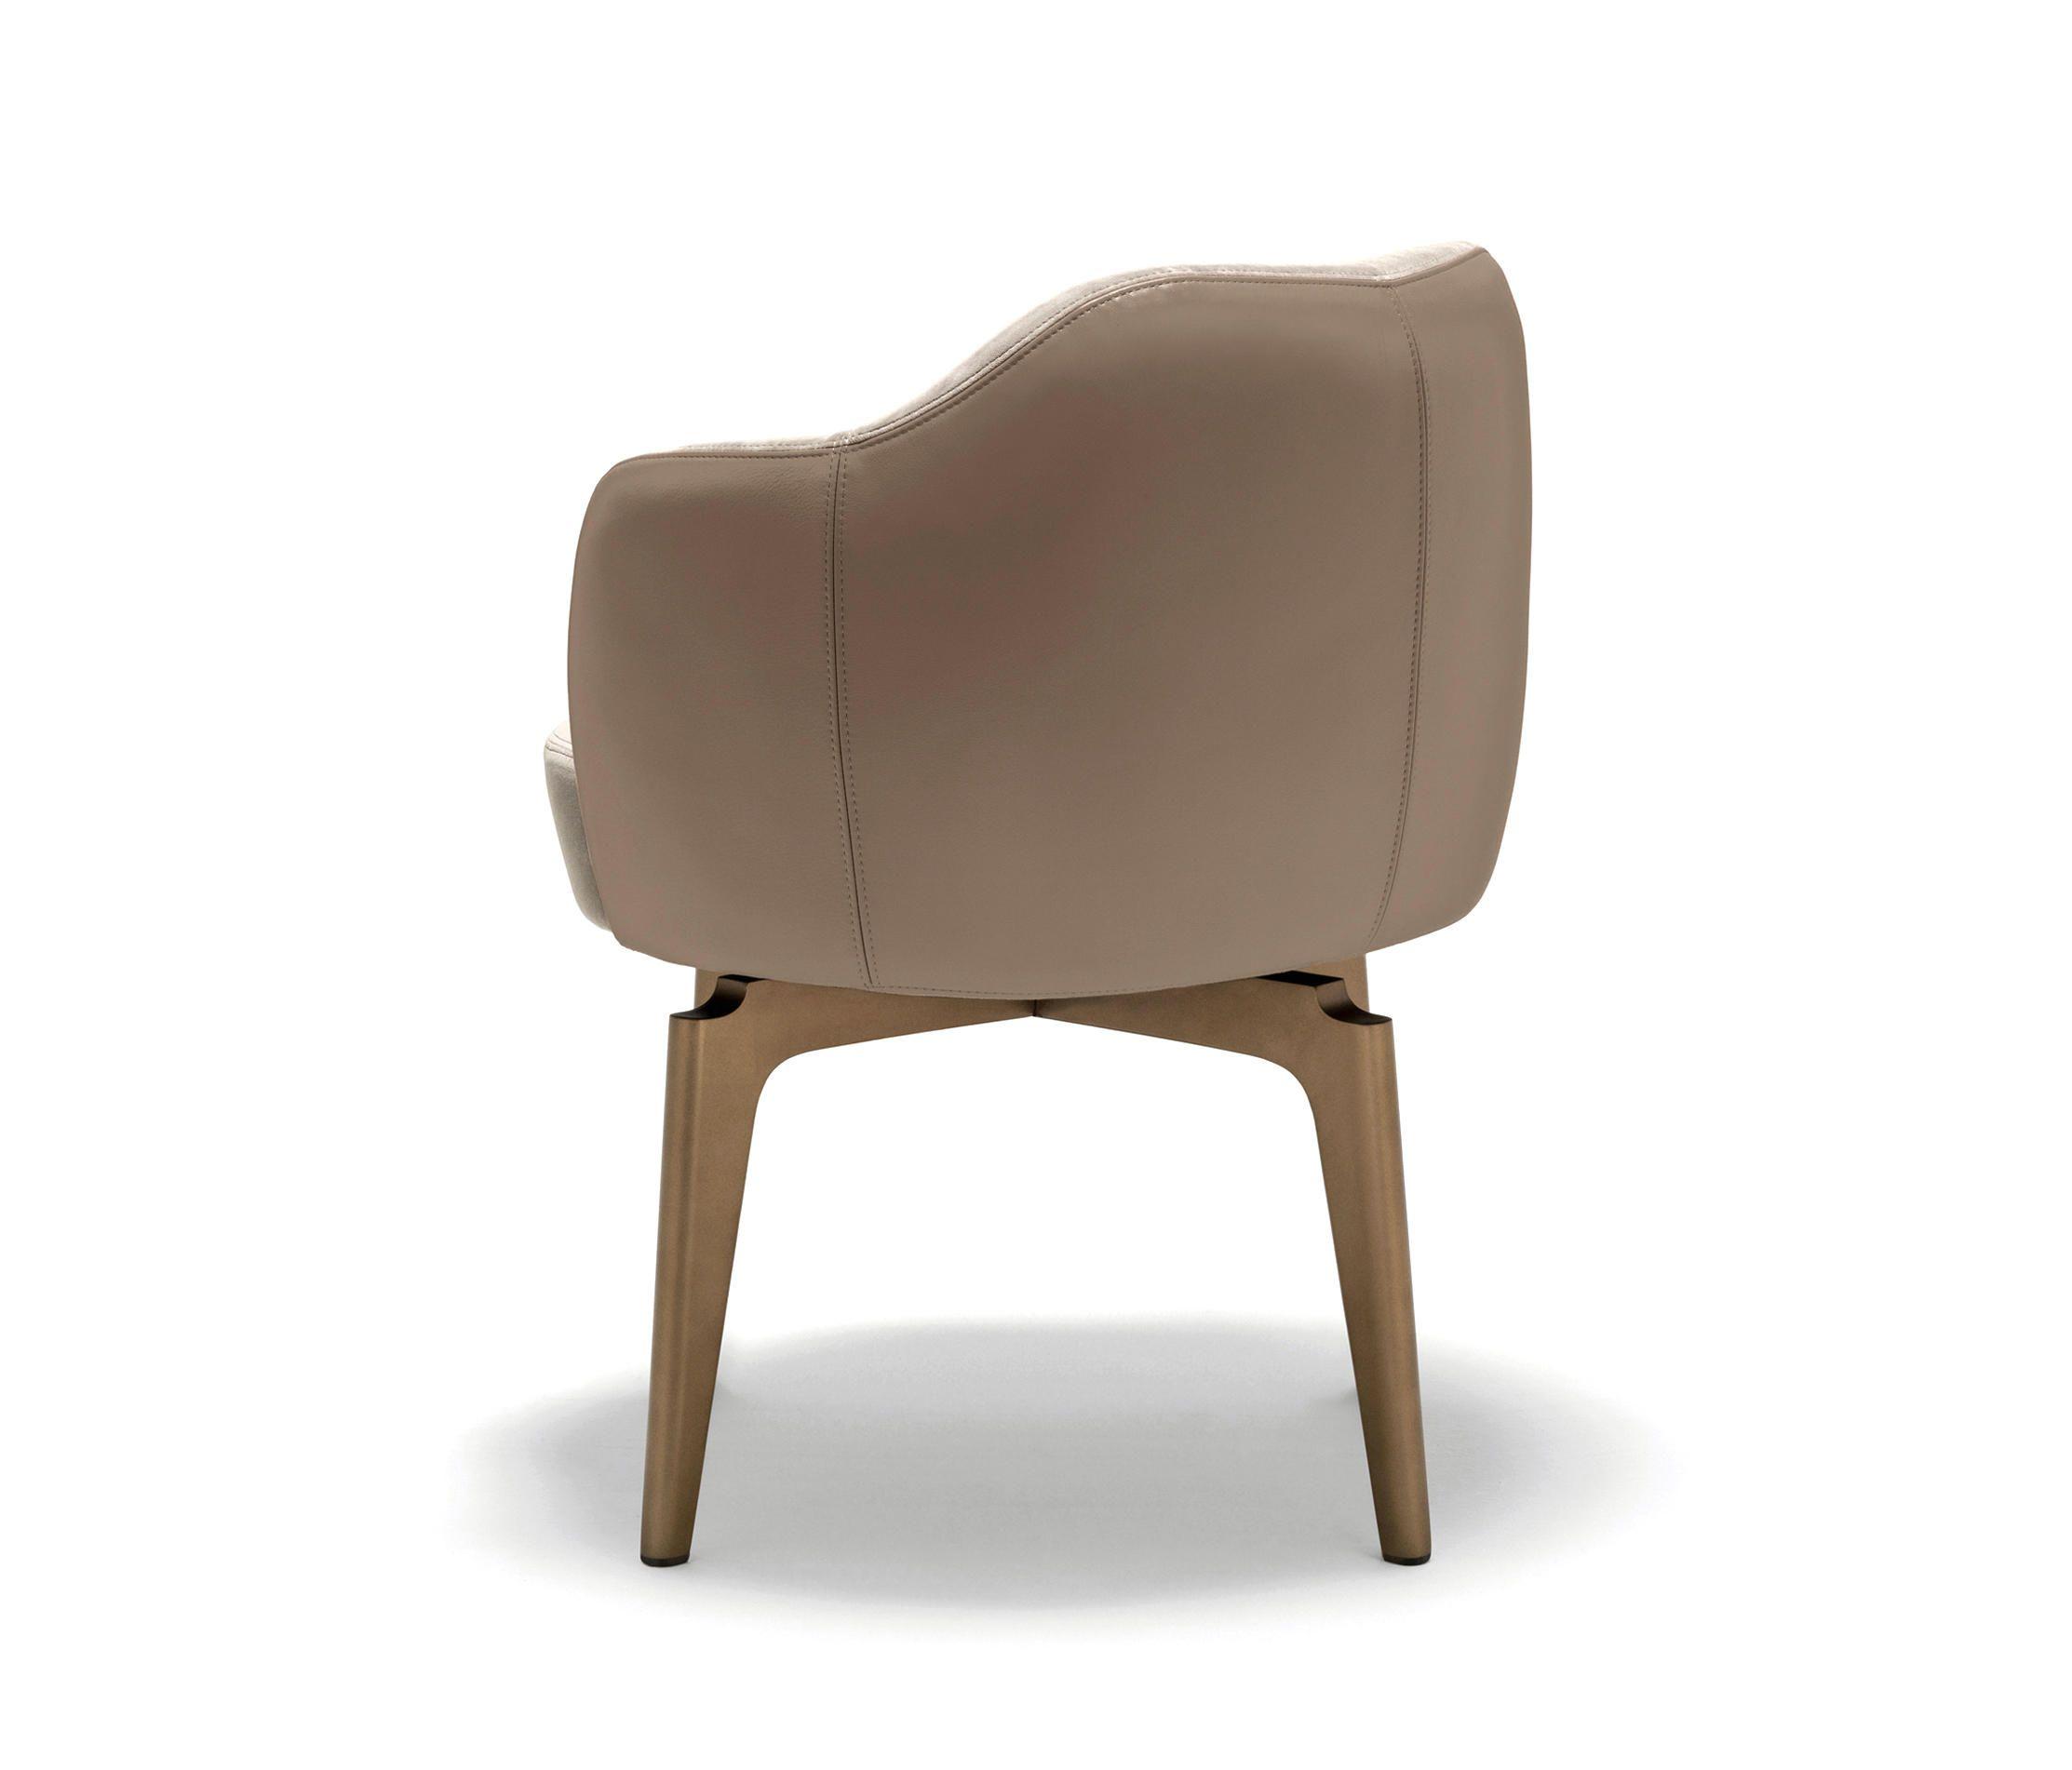 Kleine Raume Kleine Graue Stuhl Blau Schlafzimmer Sessel Schlafzimmer Stuhle Billig Billig Sessel Billig Akzent Akzent Stuhle St Small Armchair Armchair Chair